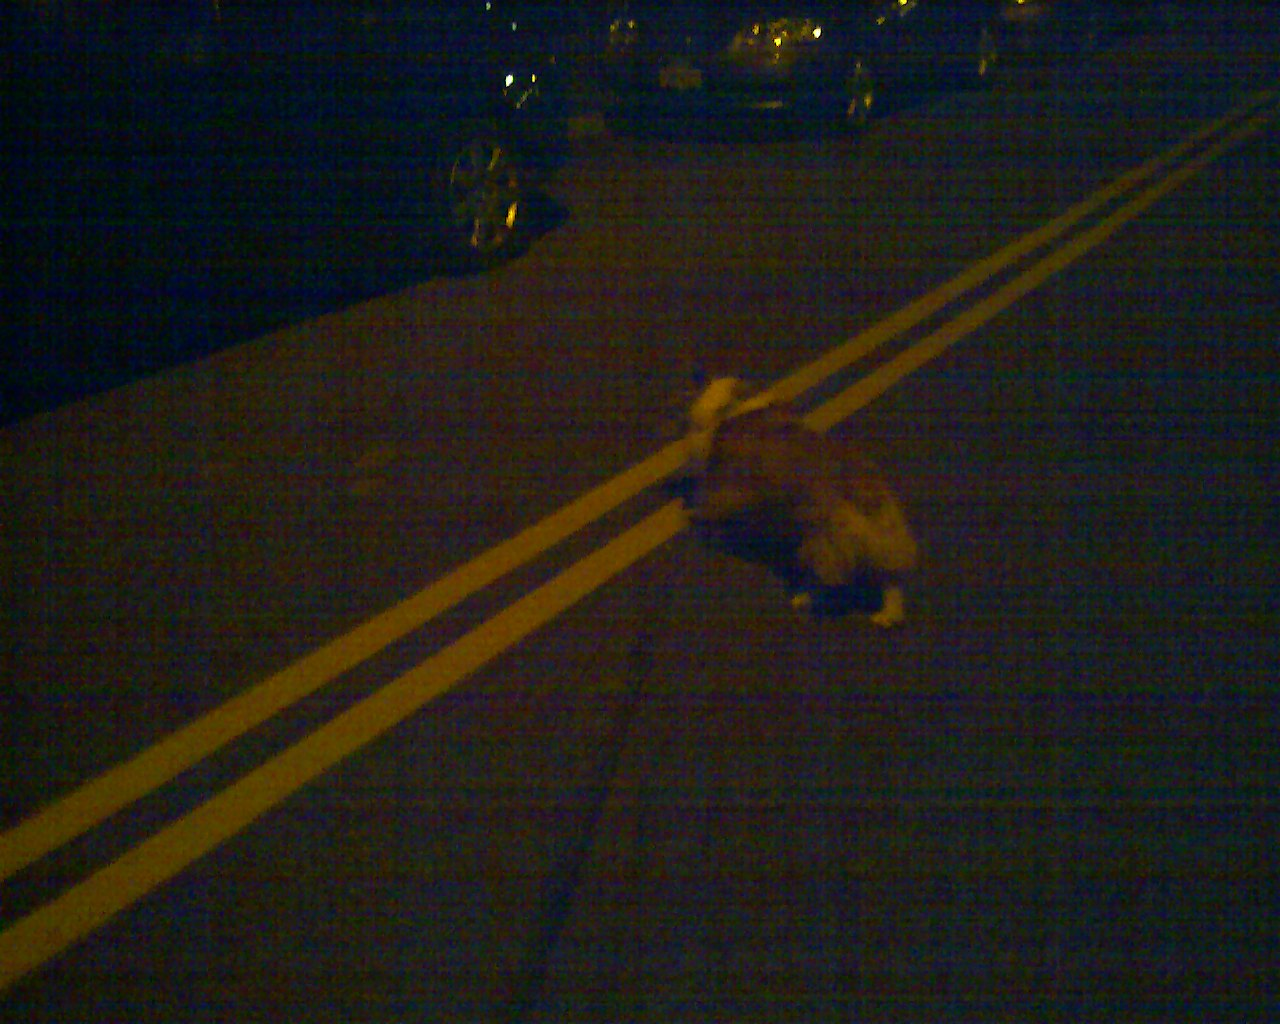 夜の散歩_e0147716_4112850.jpg